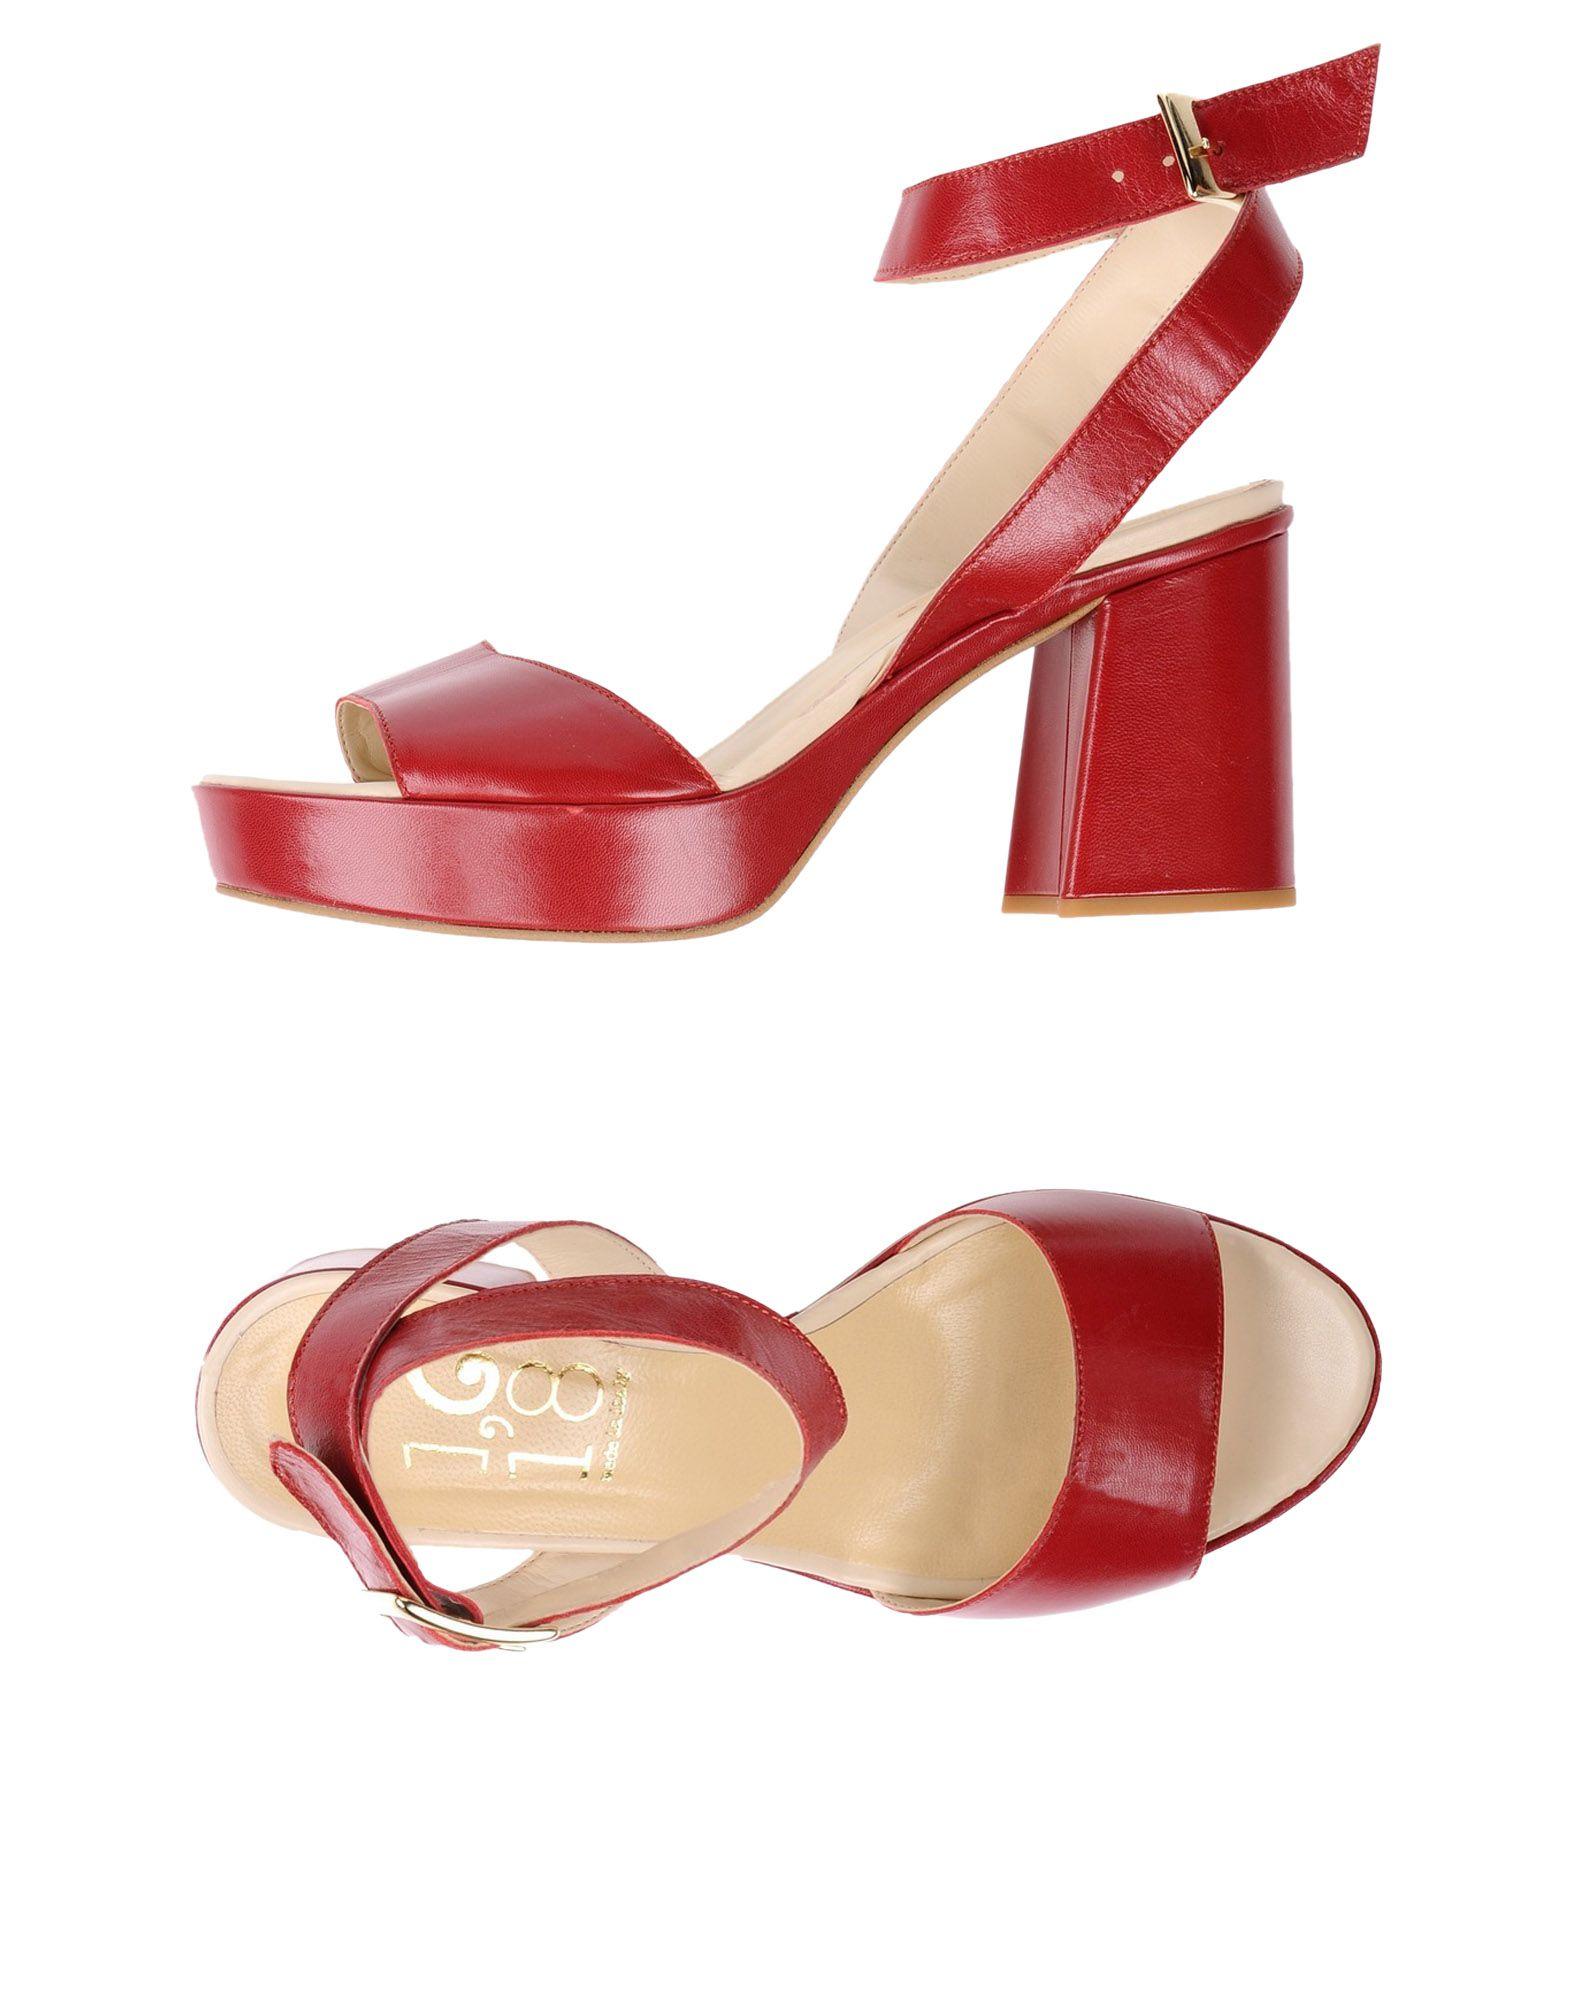 Sandales 1,618 Femme - Sandales 1,618 sur